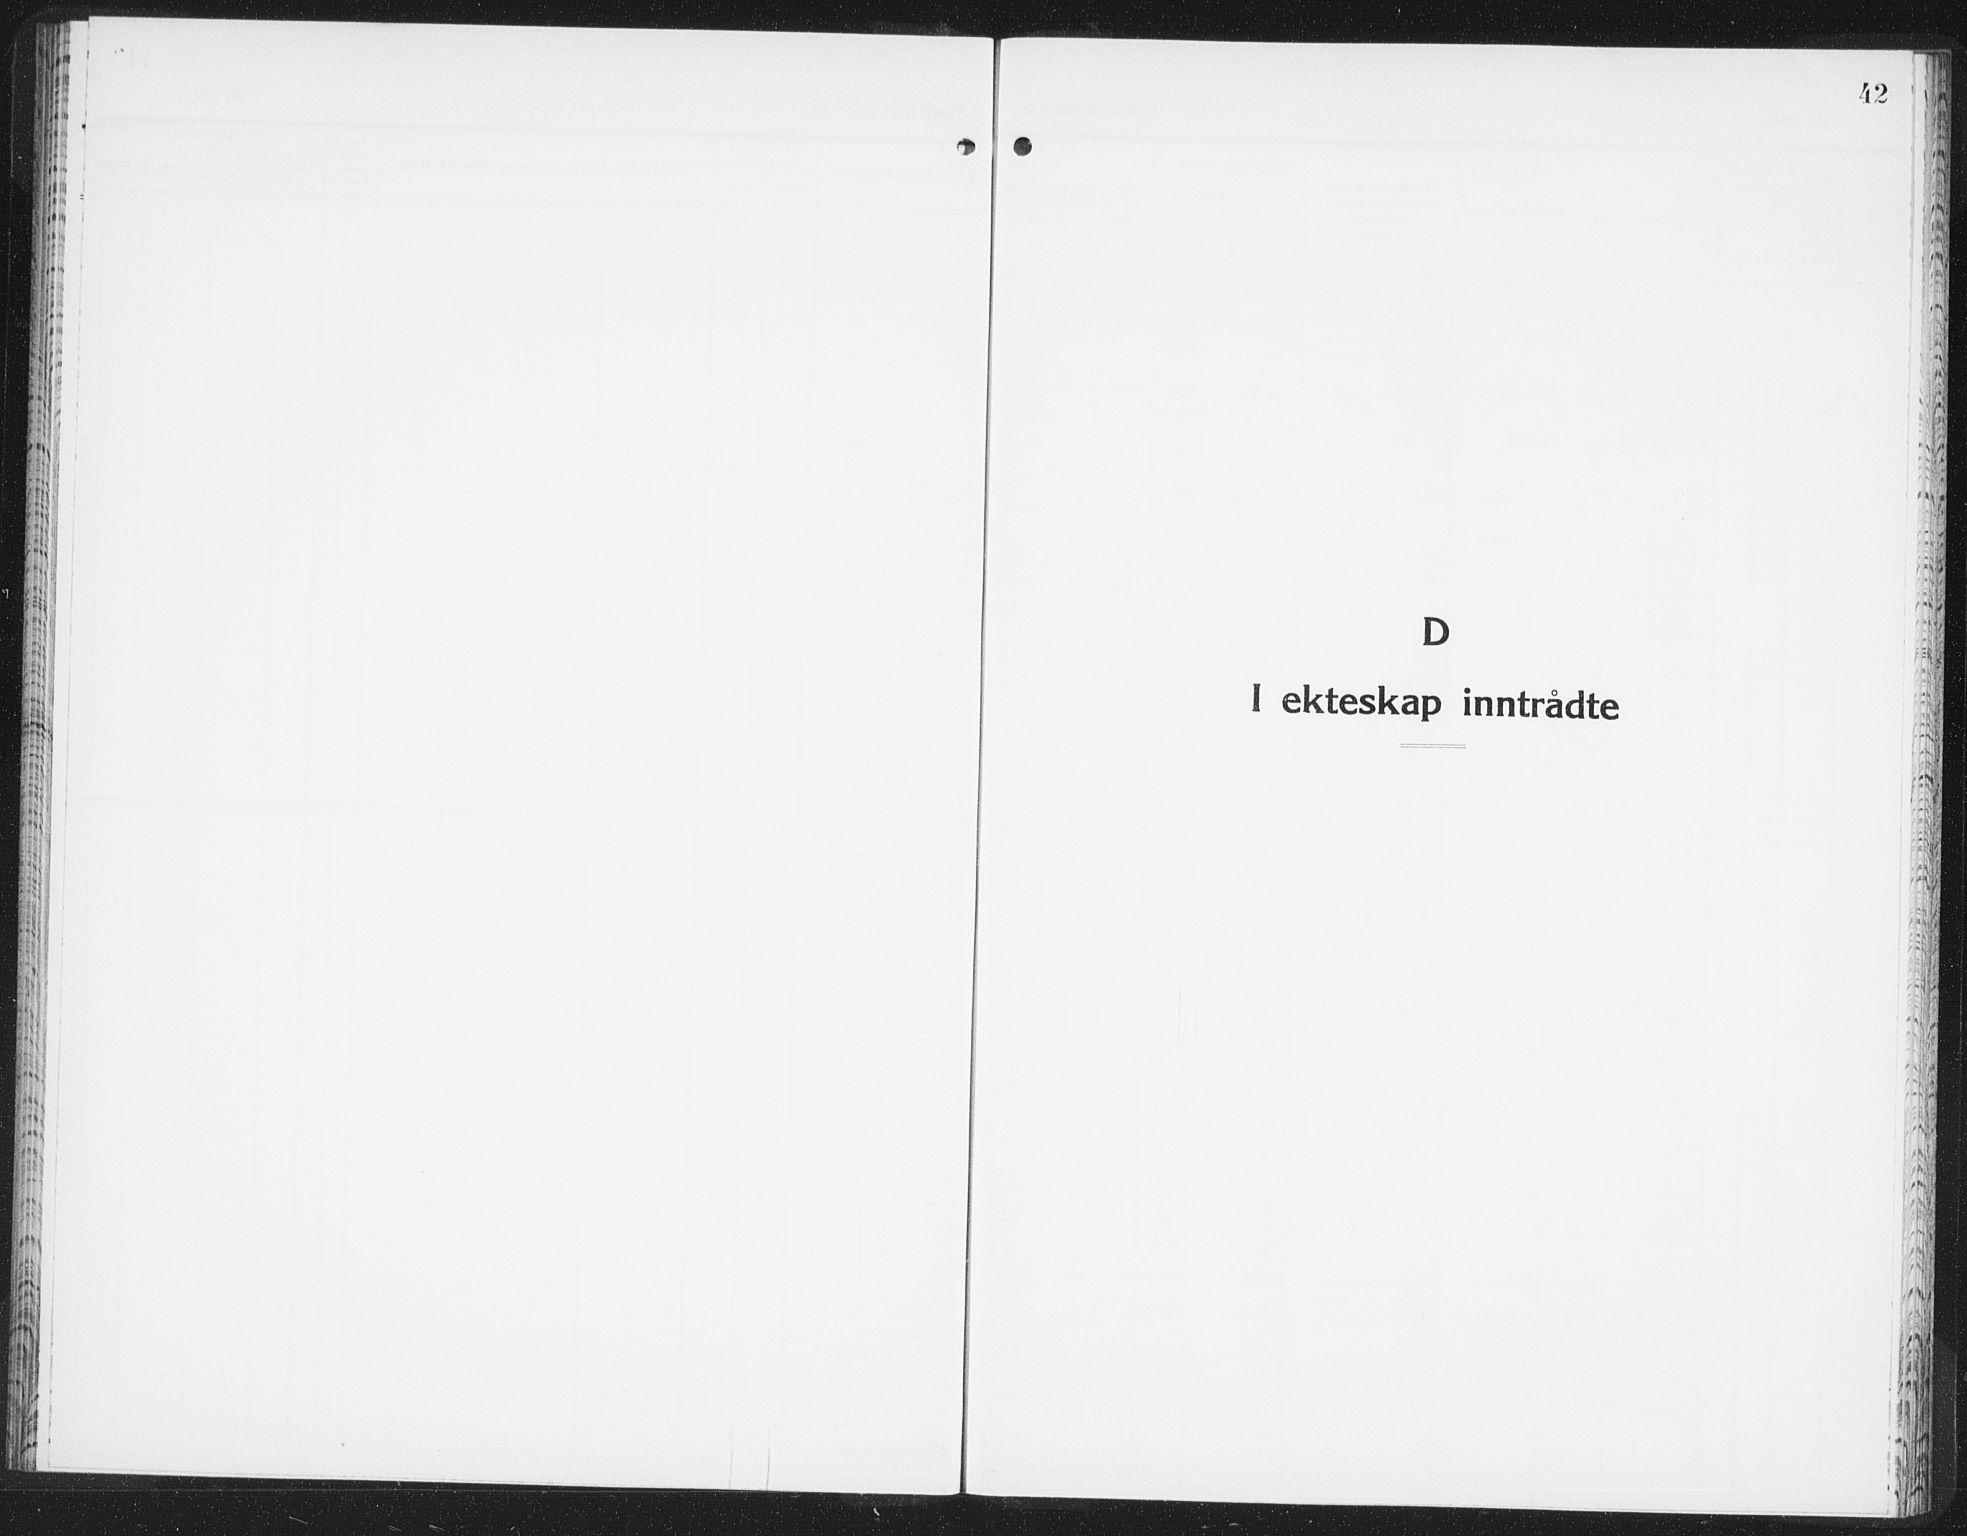 SAO, Halden prestekontor Kirkebøker, F/Fb/L0002: Ministerialbok nr. II 2, 1933-1942, s. 42